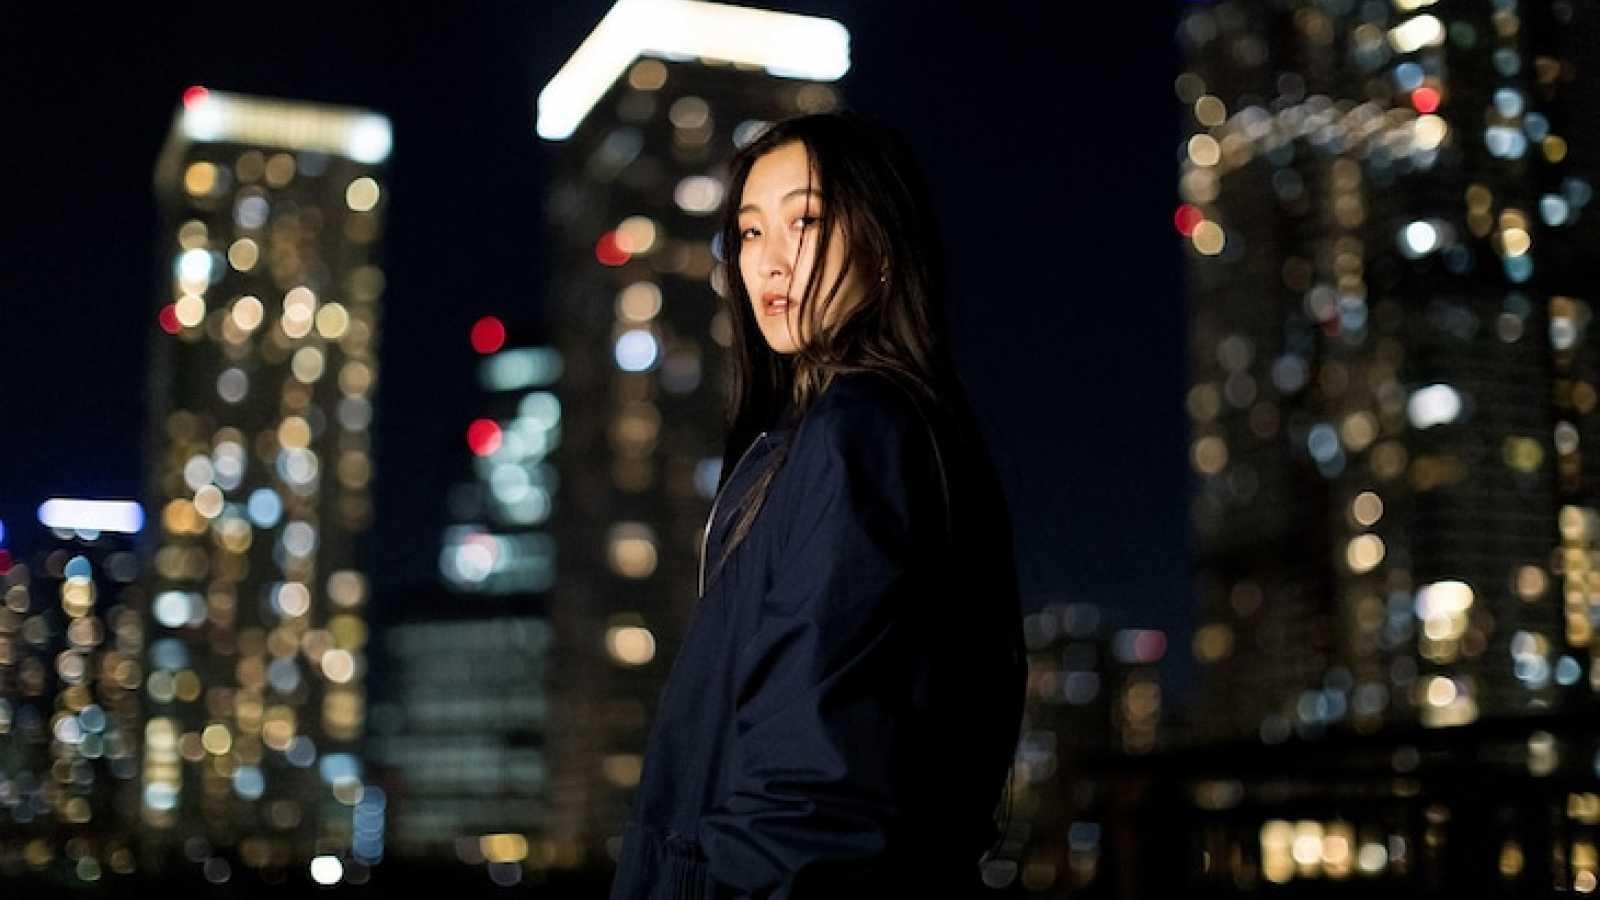 Nao Kawamura Releases New Digital Single featuring Wouter Hamel © Nao Kawamura